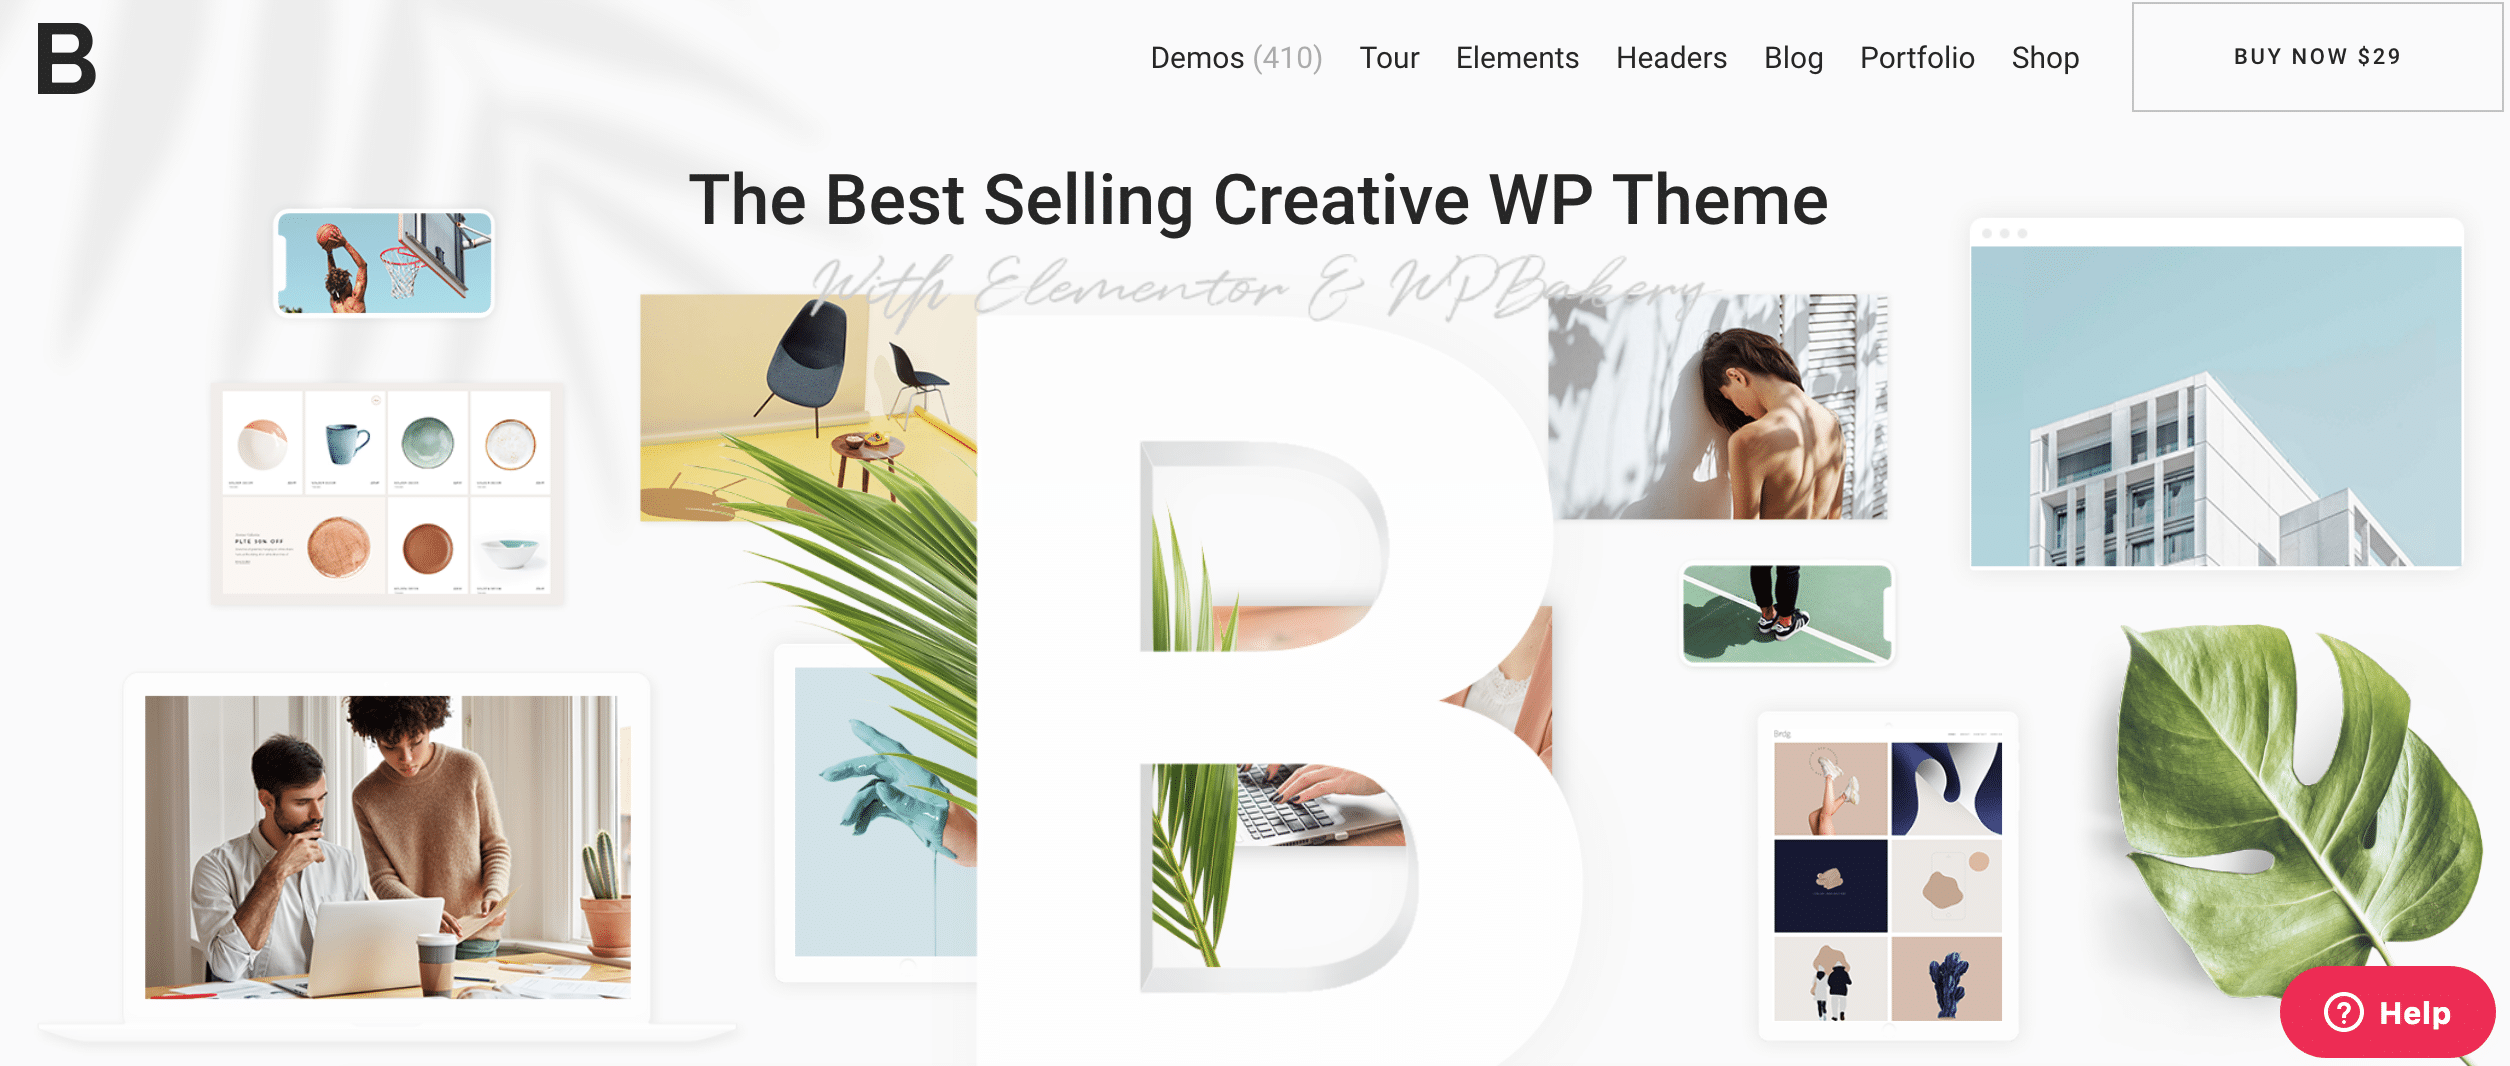 30+ Grid WordPress Themes - The Best Grid-Based WordPress Themes